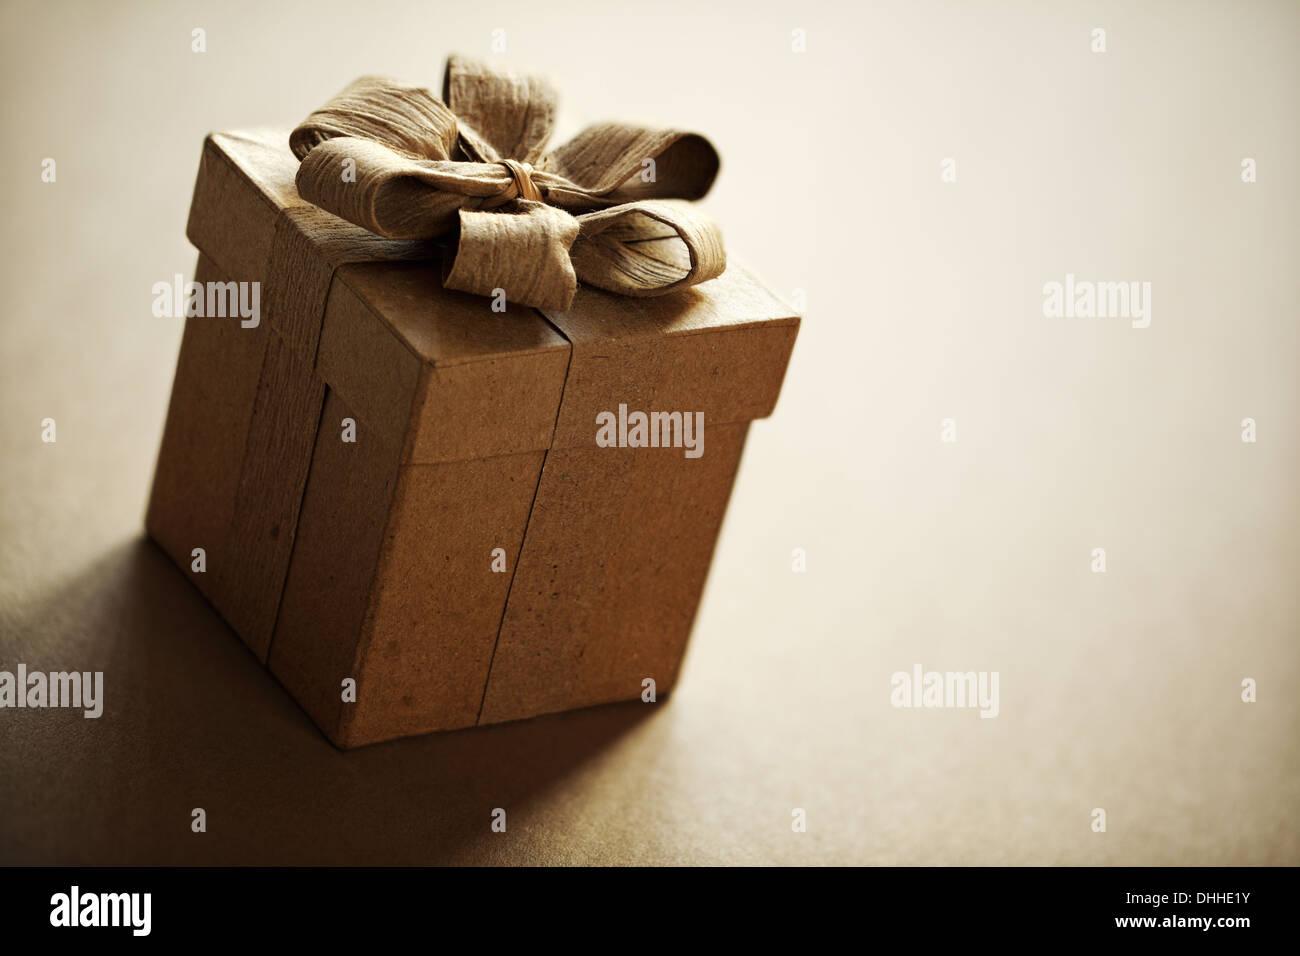 Boîte-cadeau ou cadeau de Noël Photo Stock